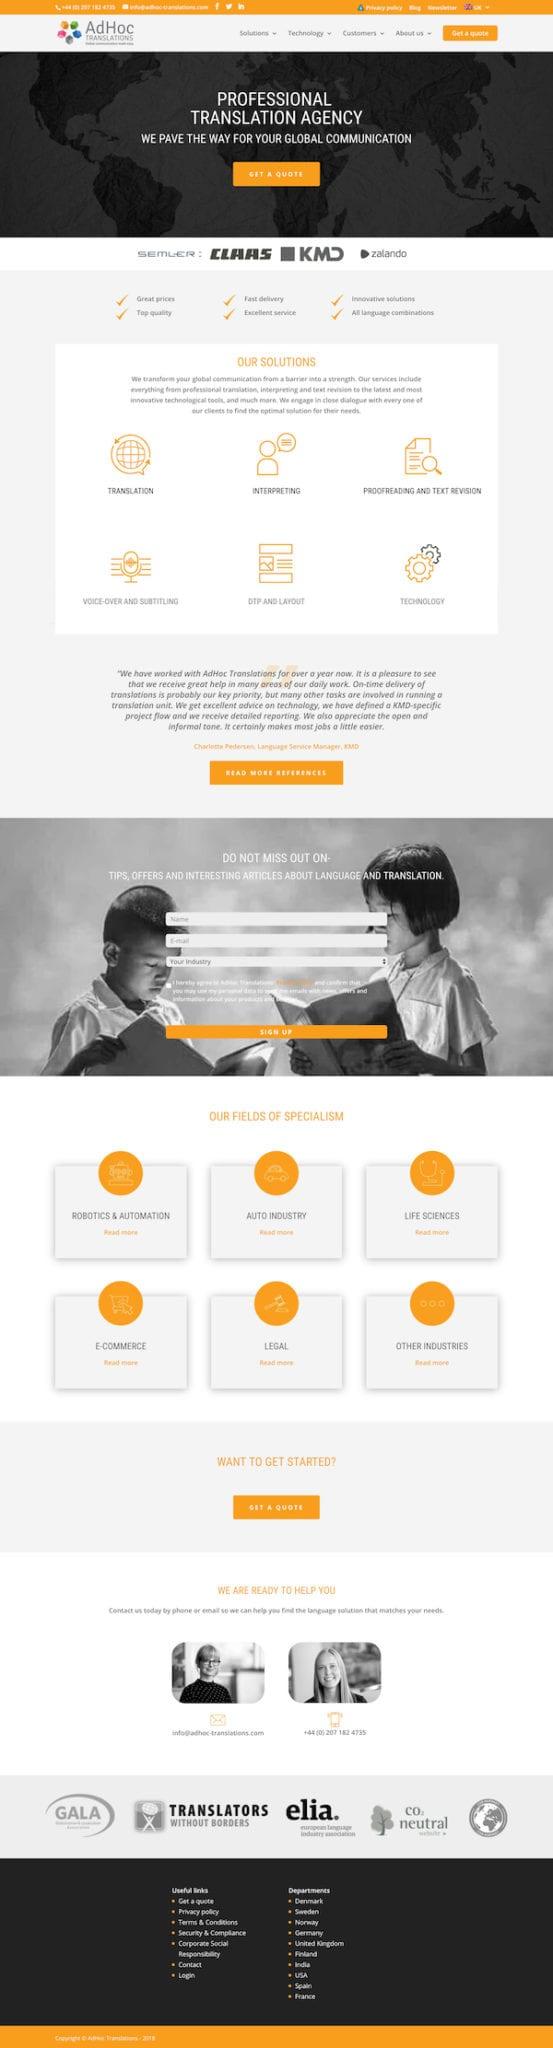 AdHoc Translation Services WordPress Website